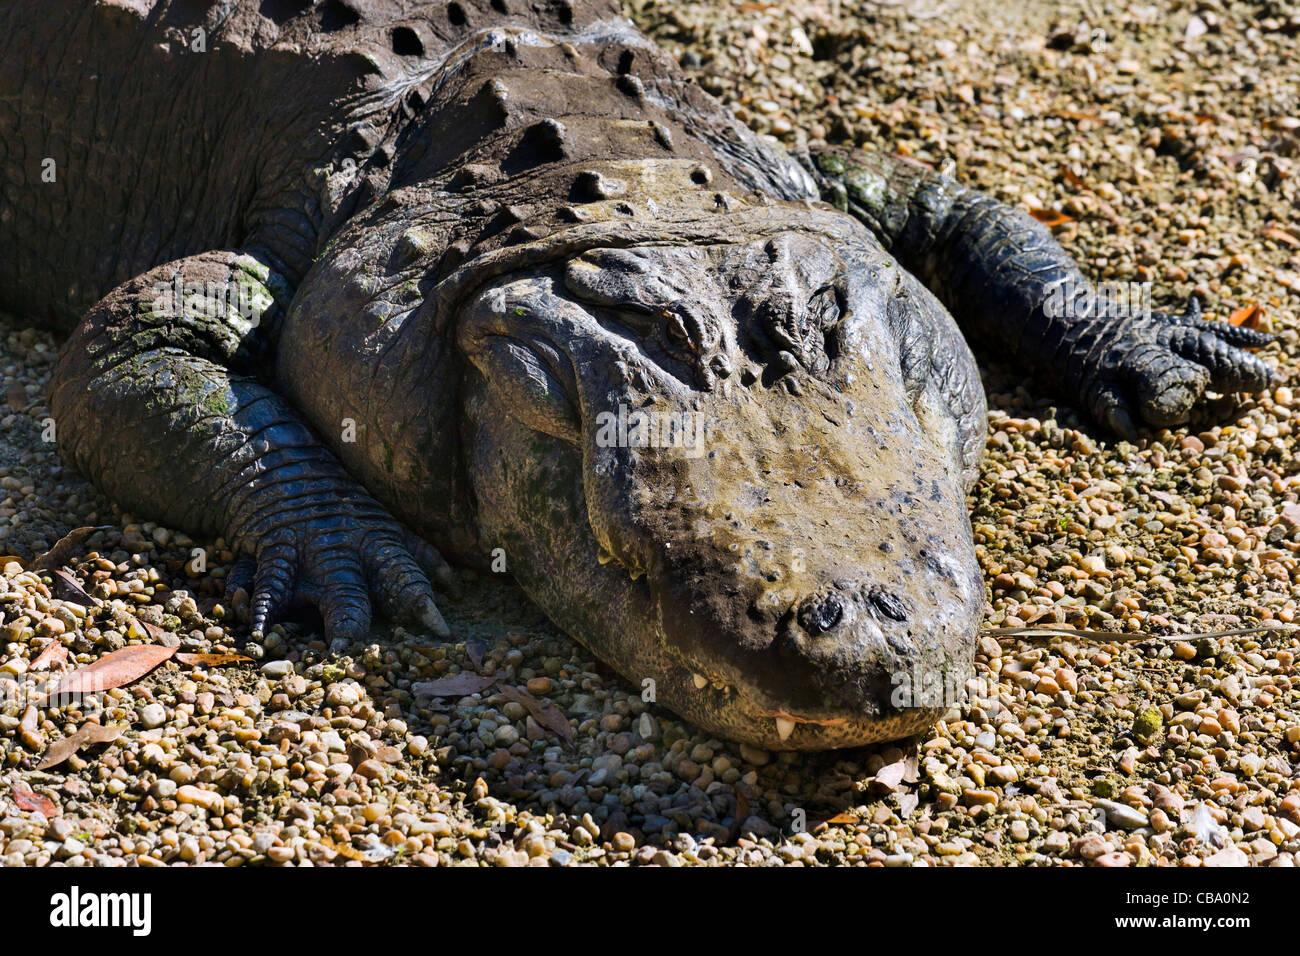 American alligator (Alligator mississippiensis), Homosassa Springs State Wildlife Park, Homosassa, Gulf Coast, Florida, - Stock Image